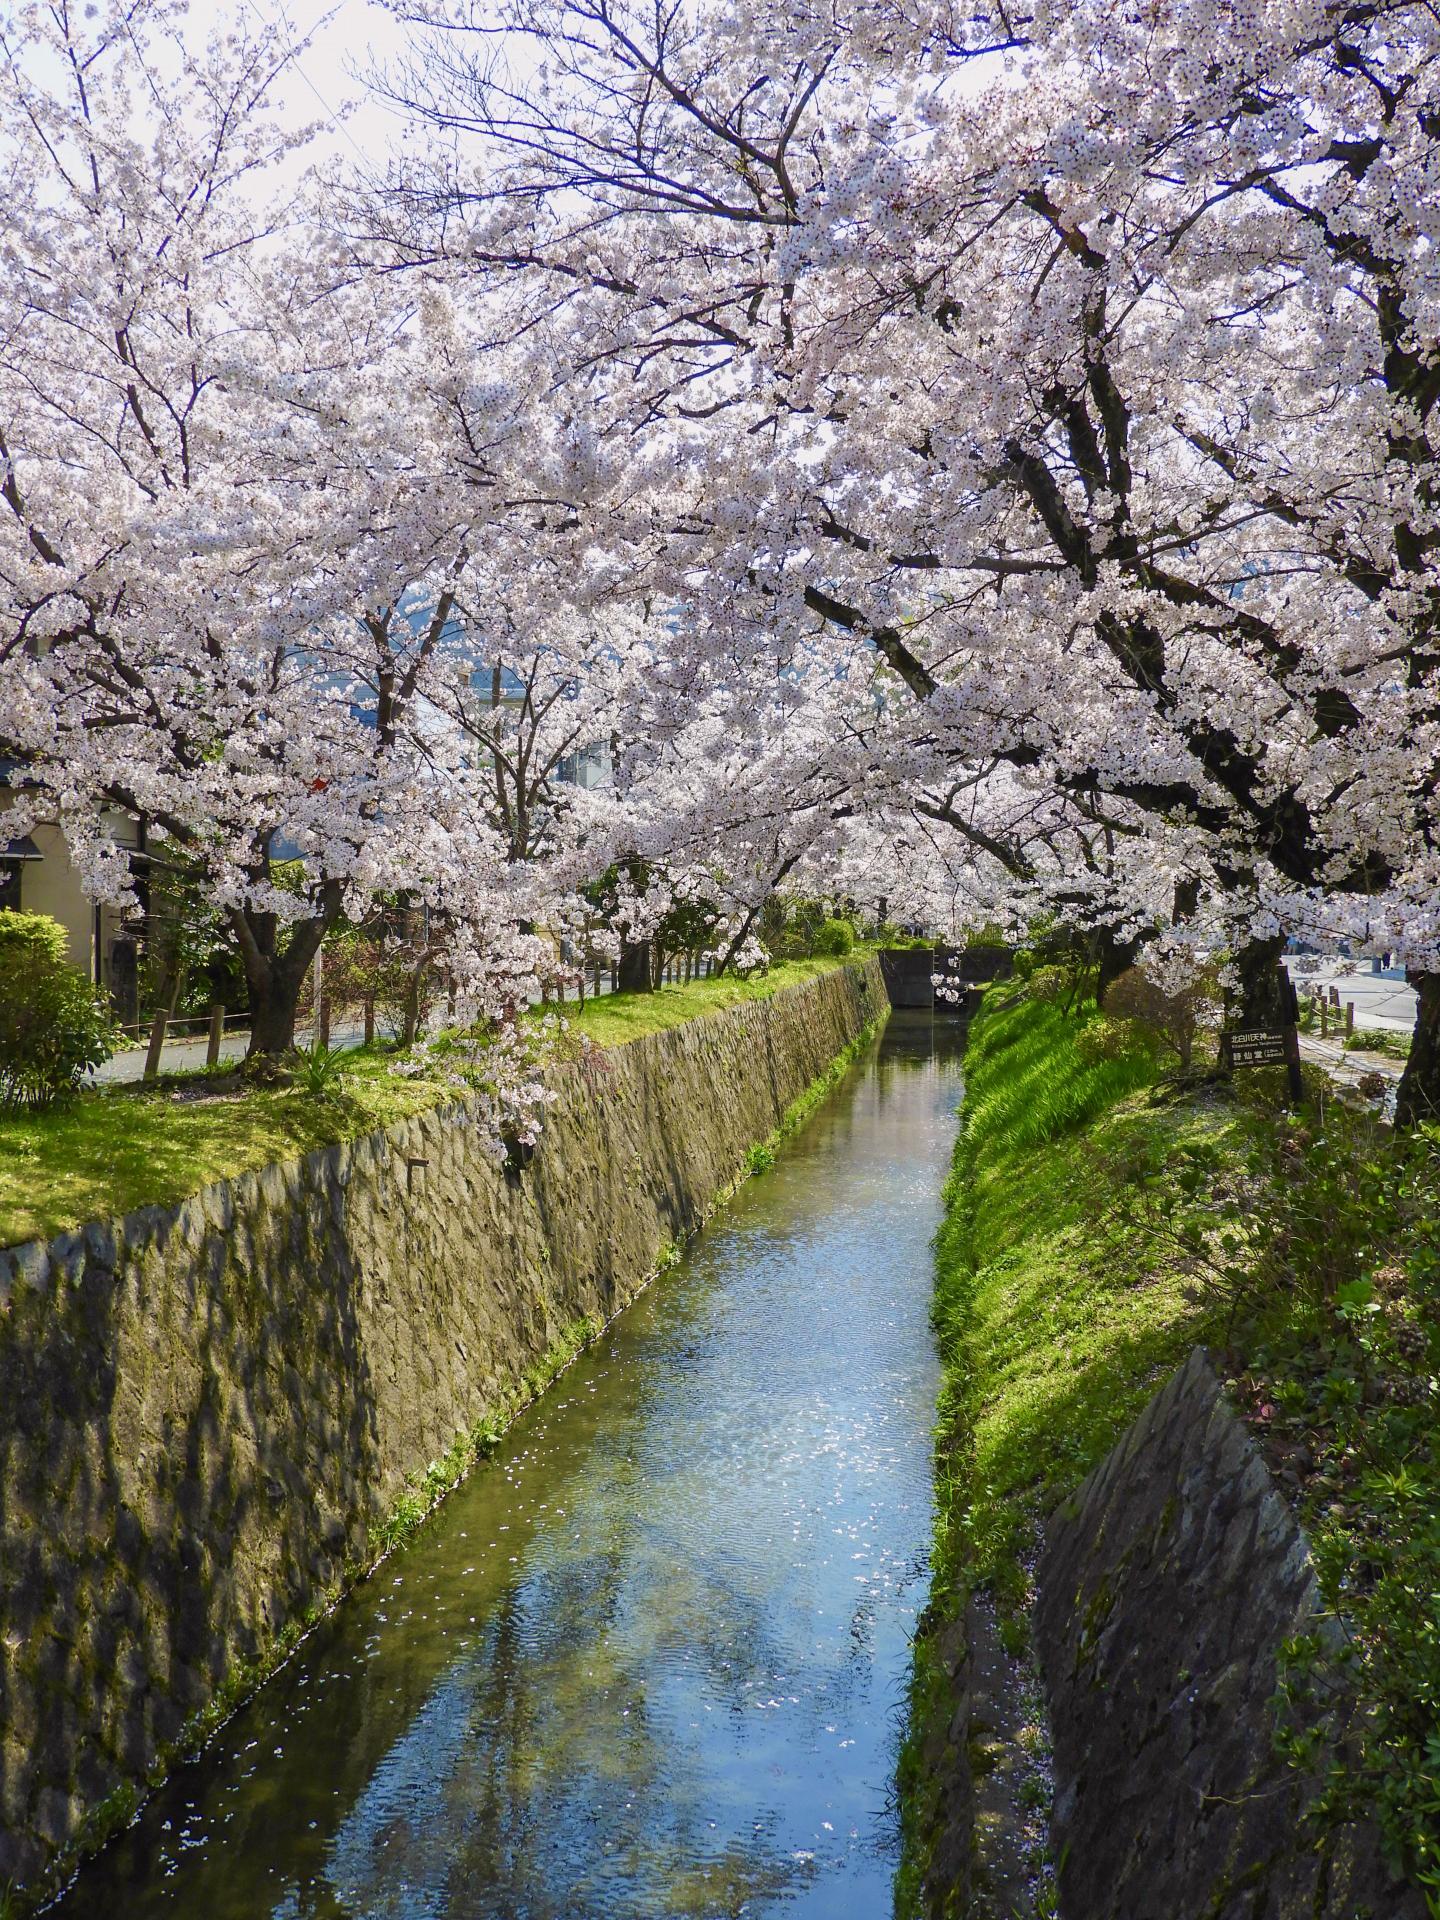 3718774_m 京都府 哲学の道(疎水沿いに咲く桜の並木道が美しい春におすすめ写真スポット! 写真の紹介、アクセス情報など)